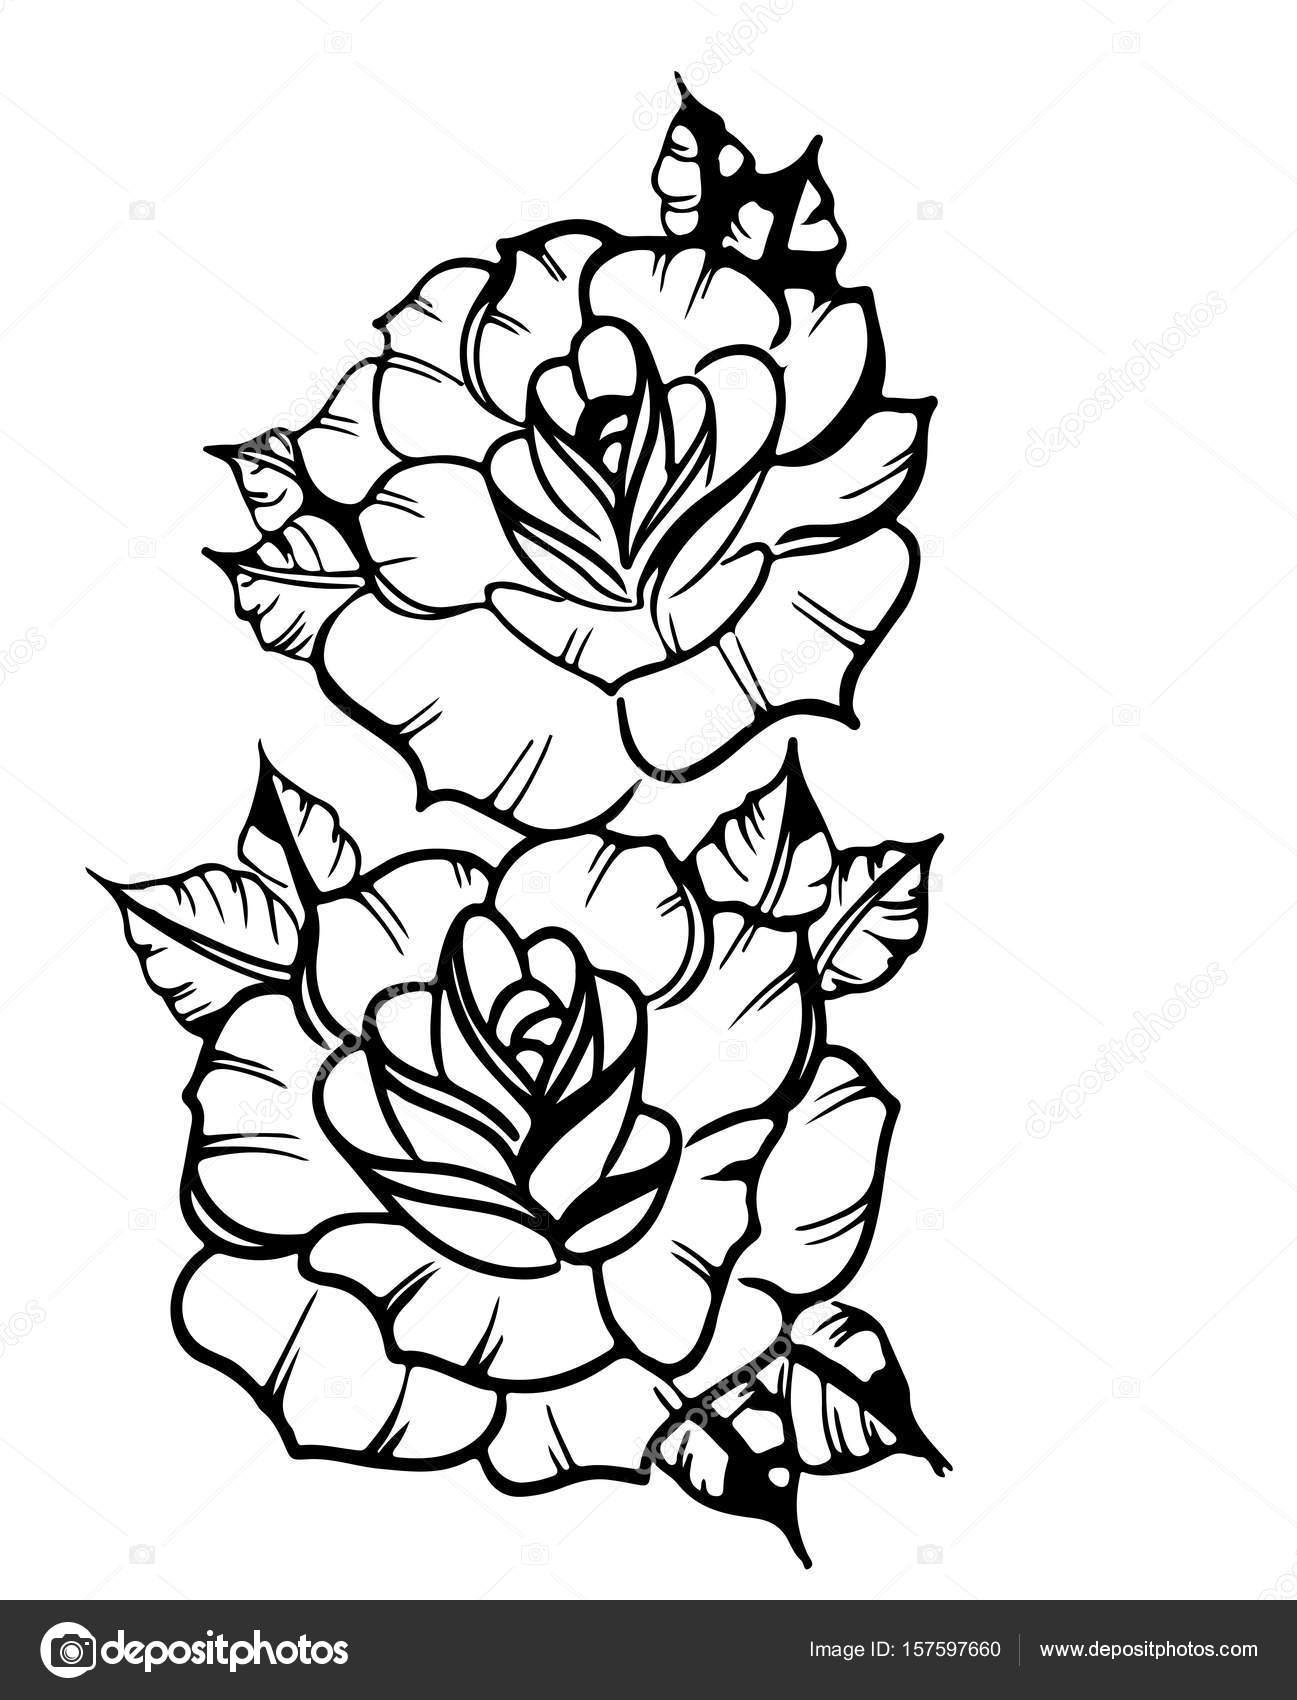 Dwie Róże Szkic Tatuaż Grafika Wektorowa Littlemagic